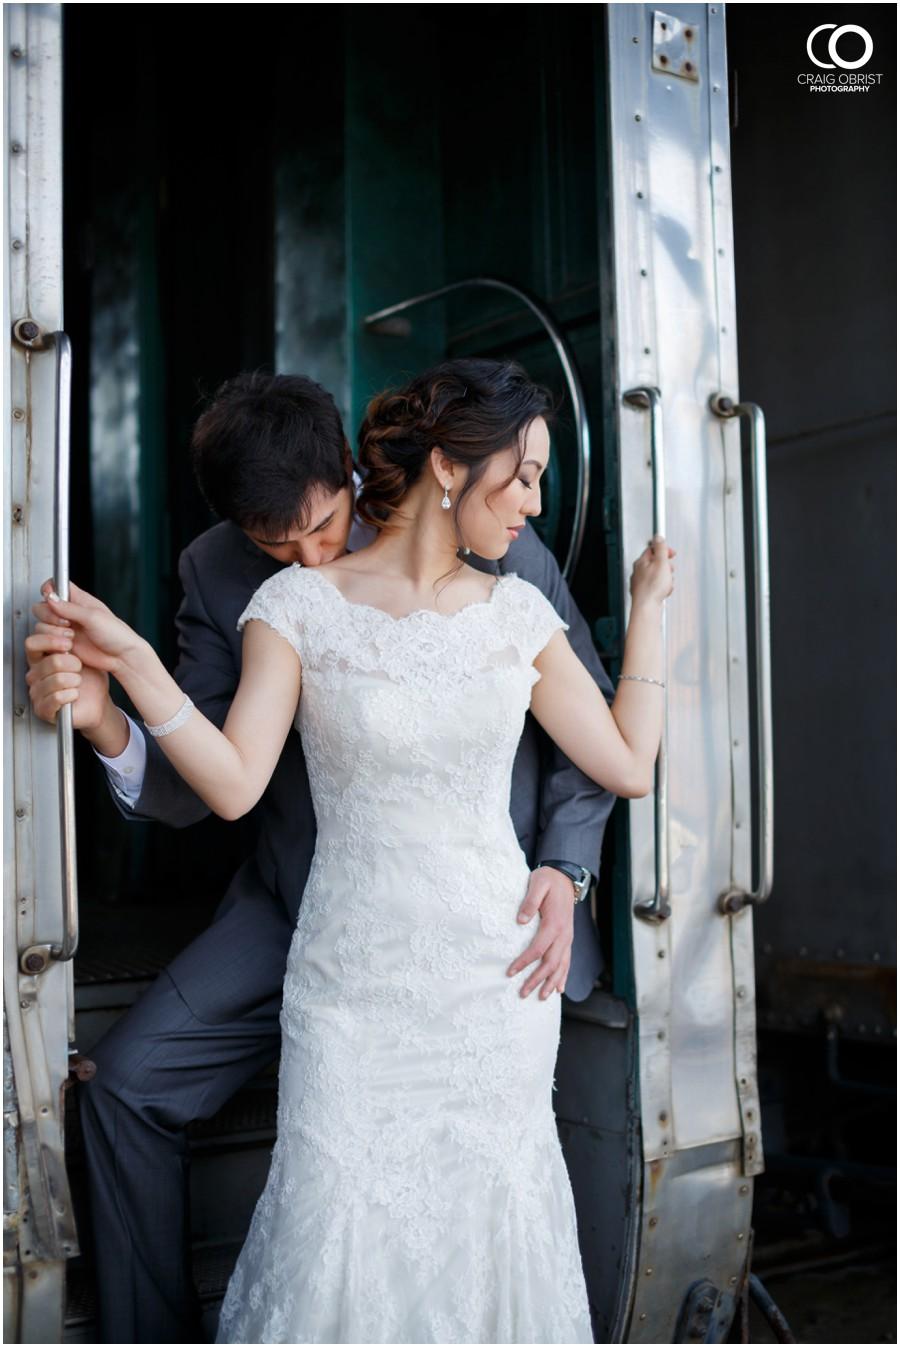 KCPC-Wedding-Duluth-Georigia-Train-museum_0035 3.jpg